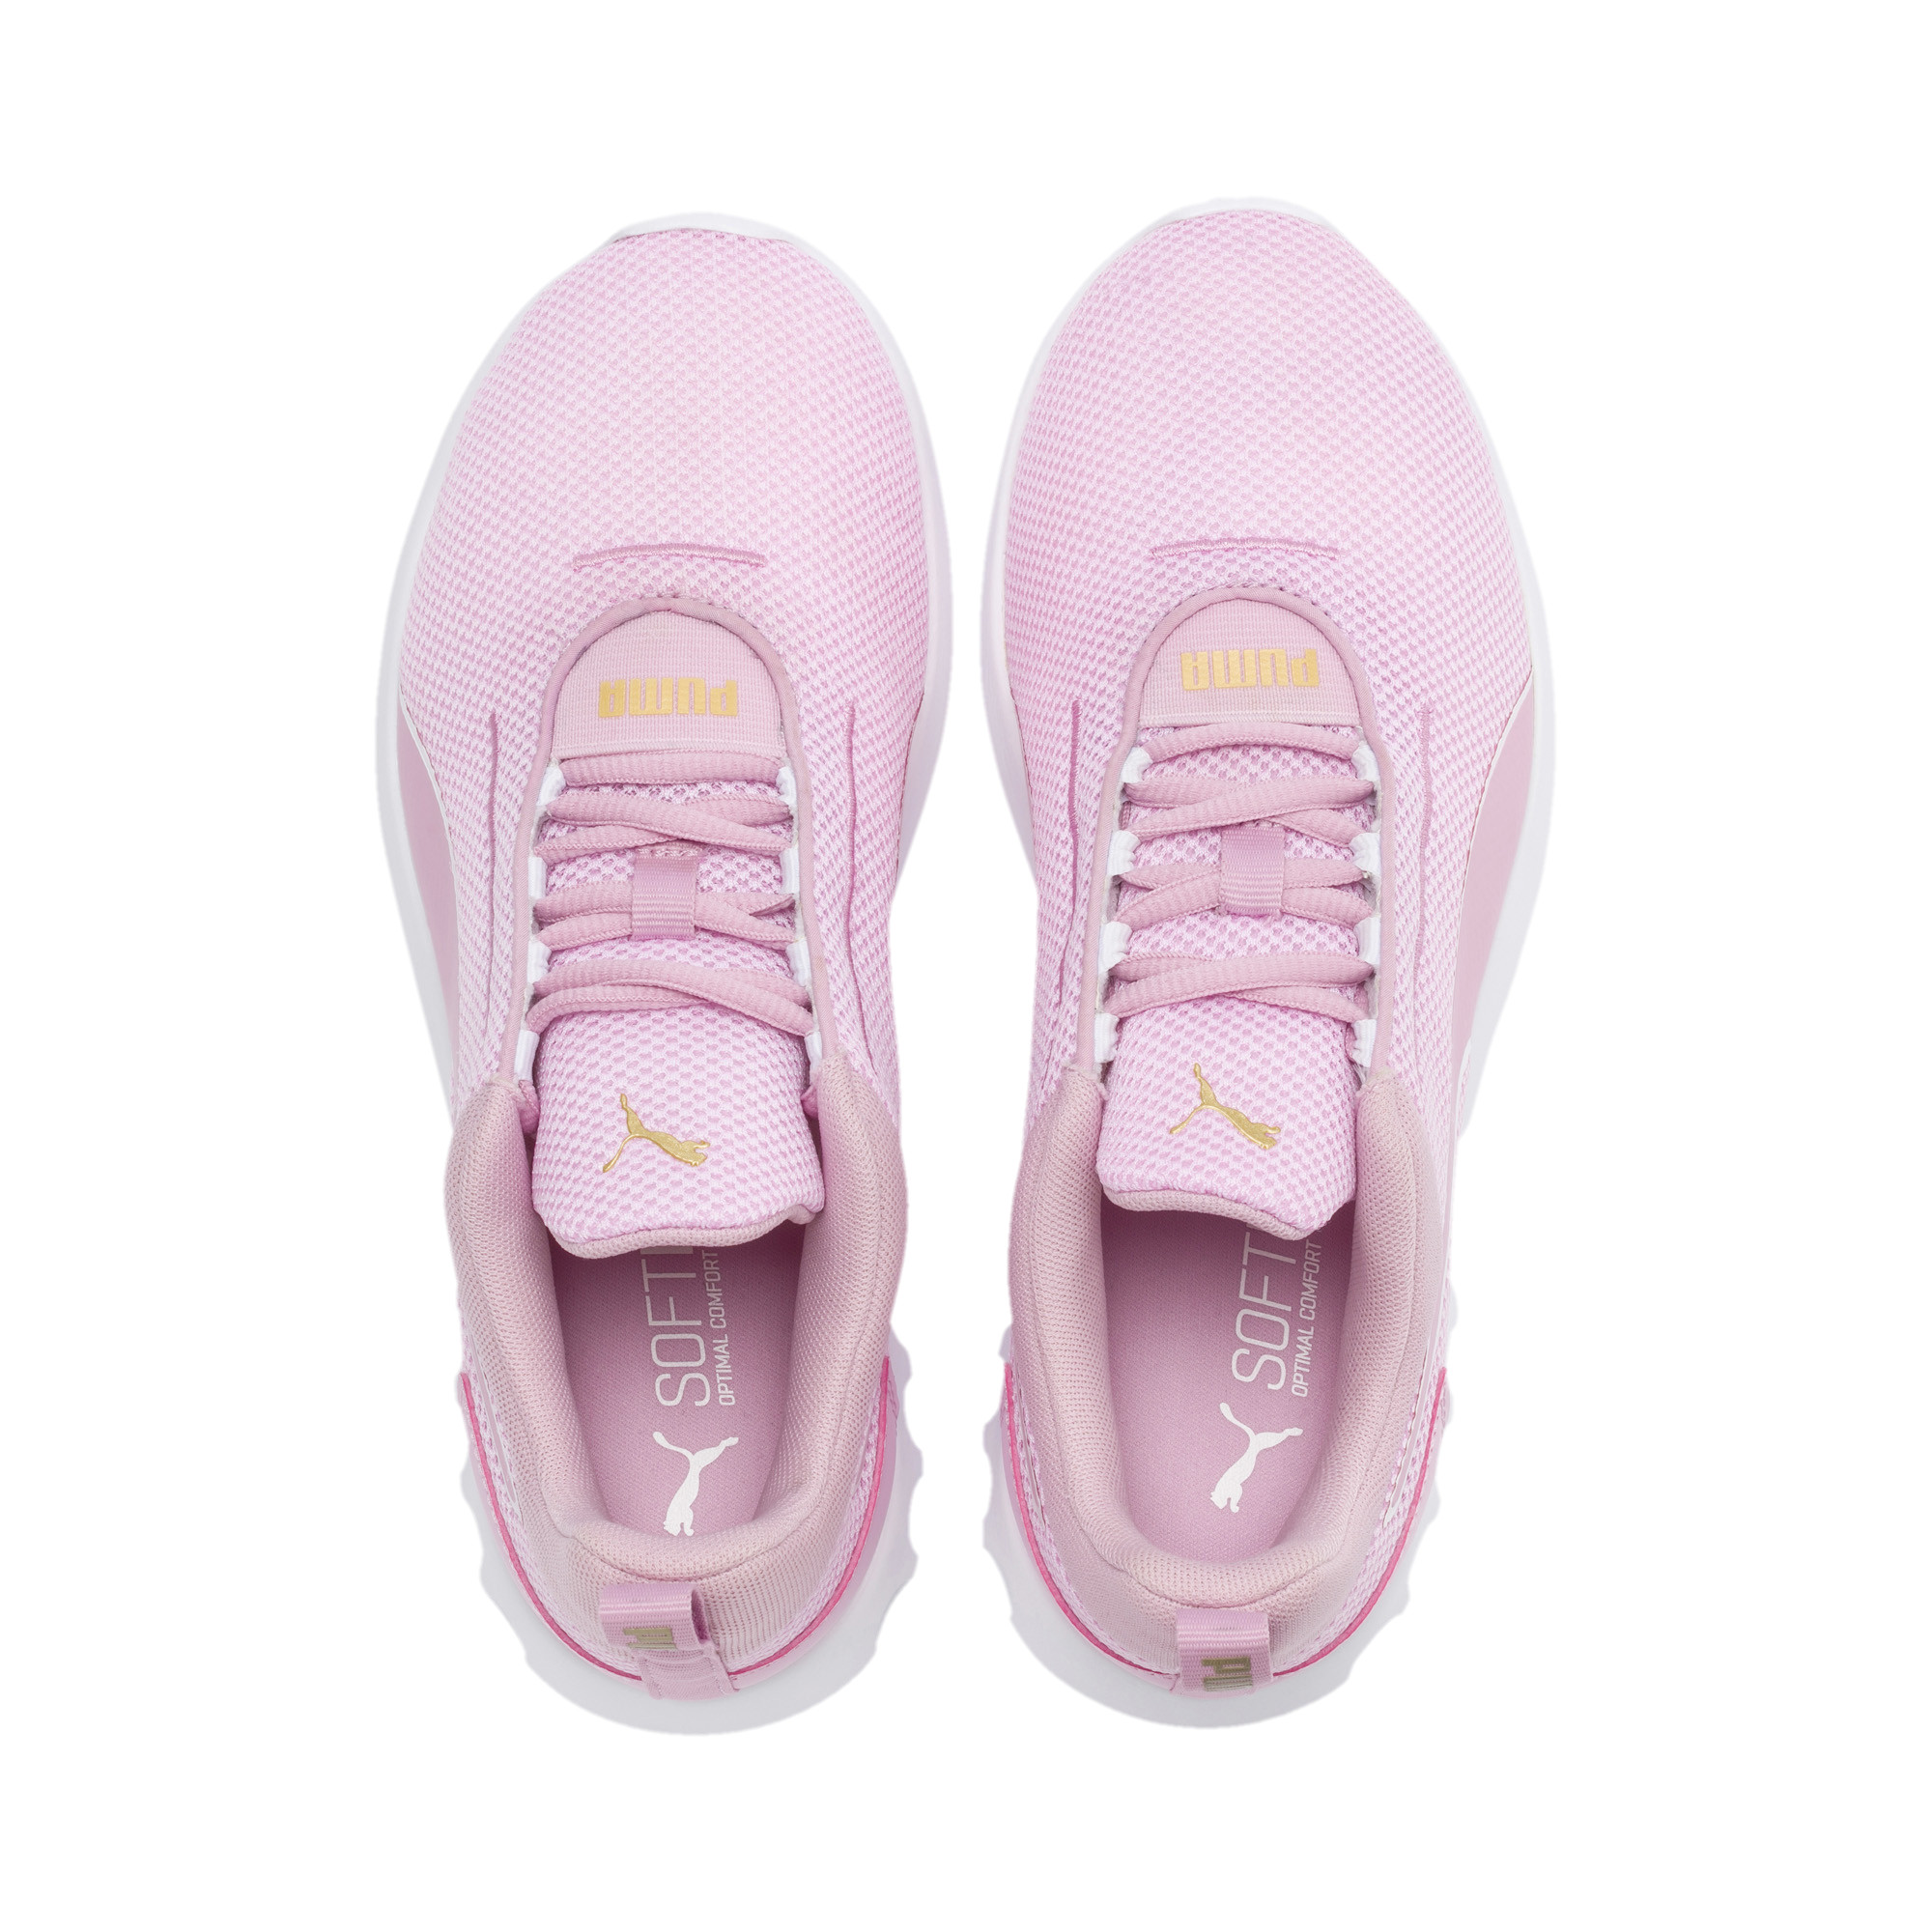 PUMA-Carson-2-Concave-Women-s-Training-Shoes-Women-Shoe-Running thumbnail 13